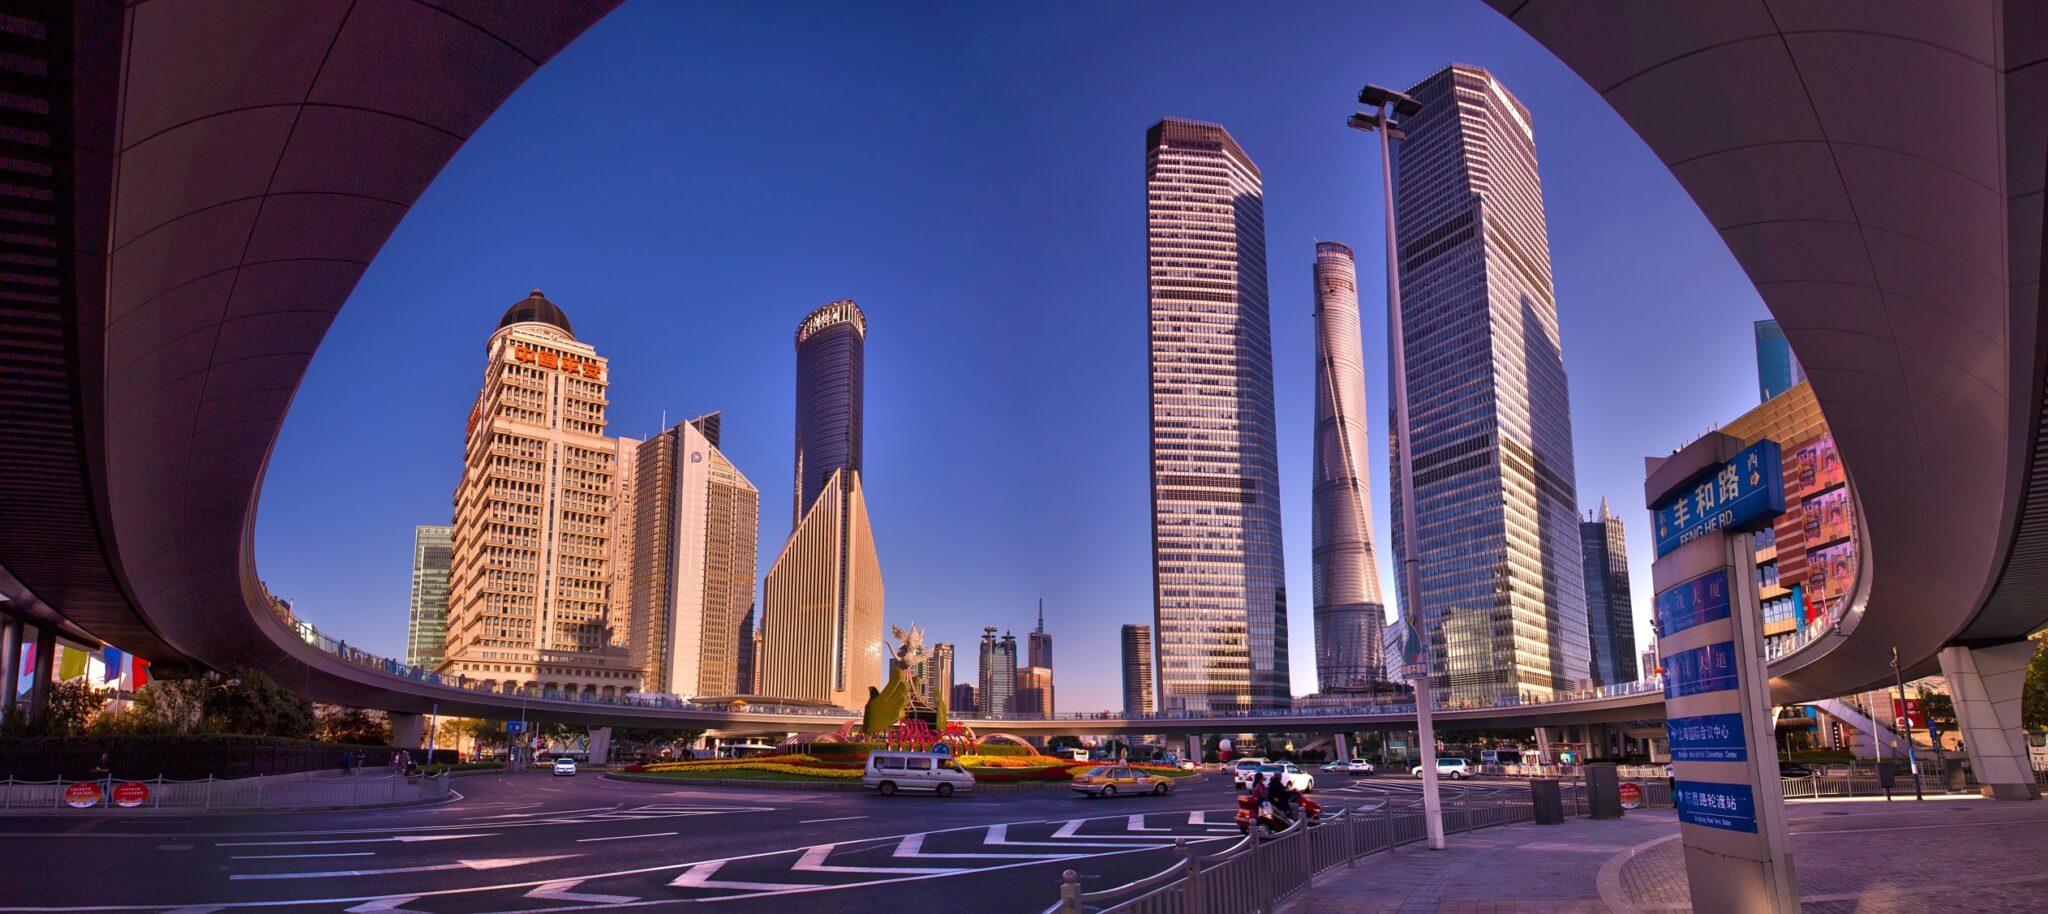 Panorama of the lu jia zui international financial centre in Shanghai